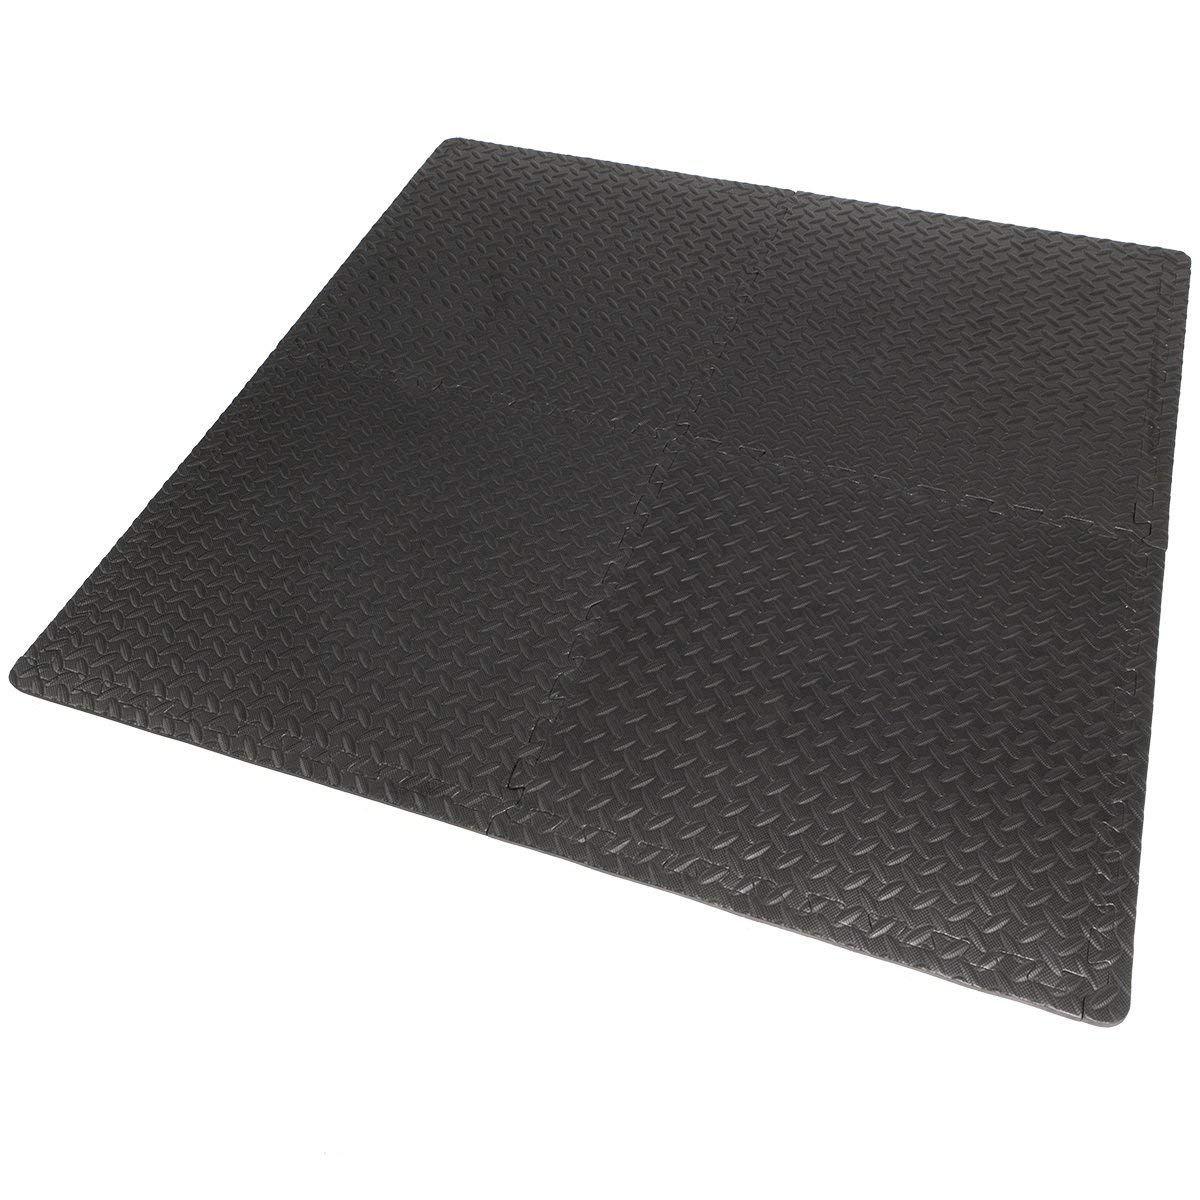 Xtremepowerus Home Exercise Mat Interlocking Tiles Puzzle Eva